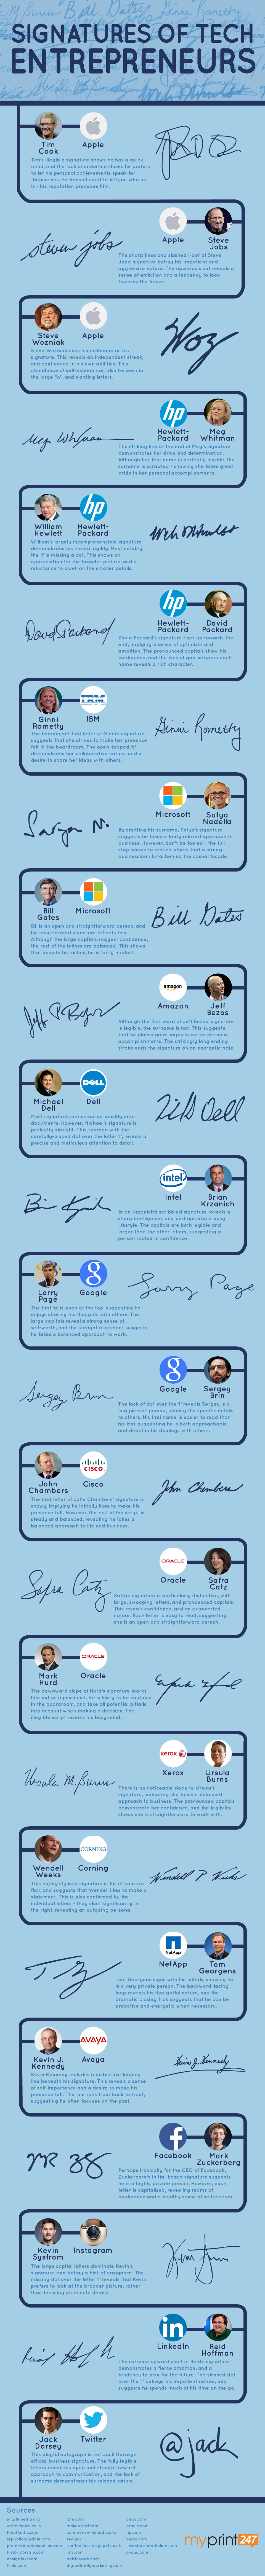 Famous-Signatures.jpg